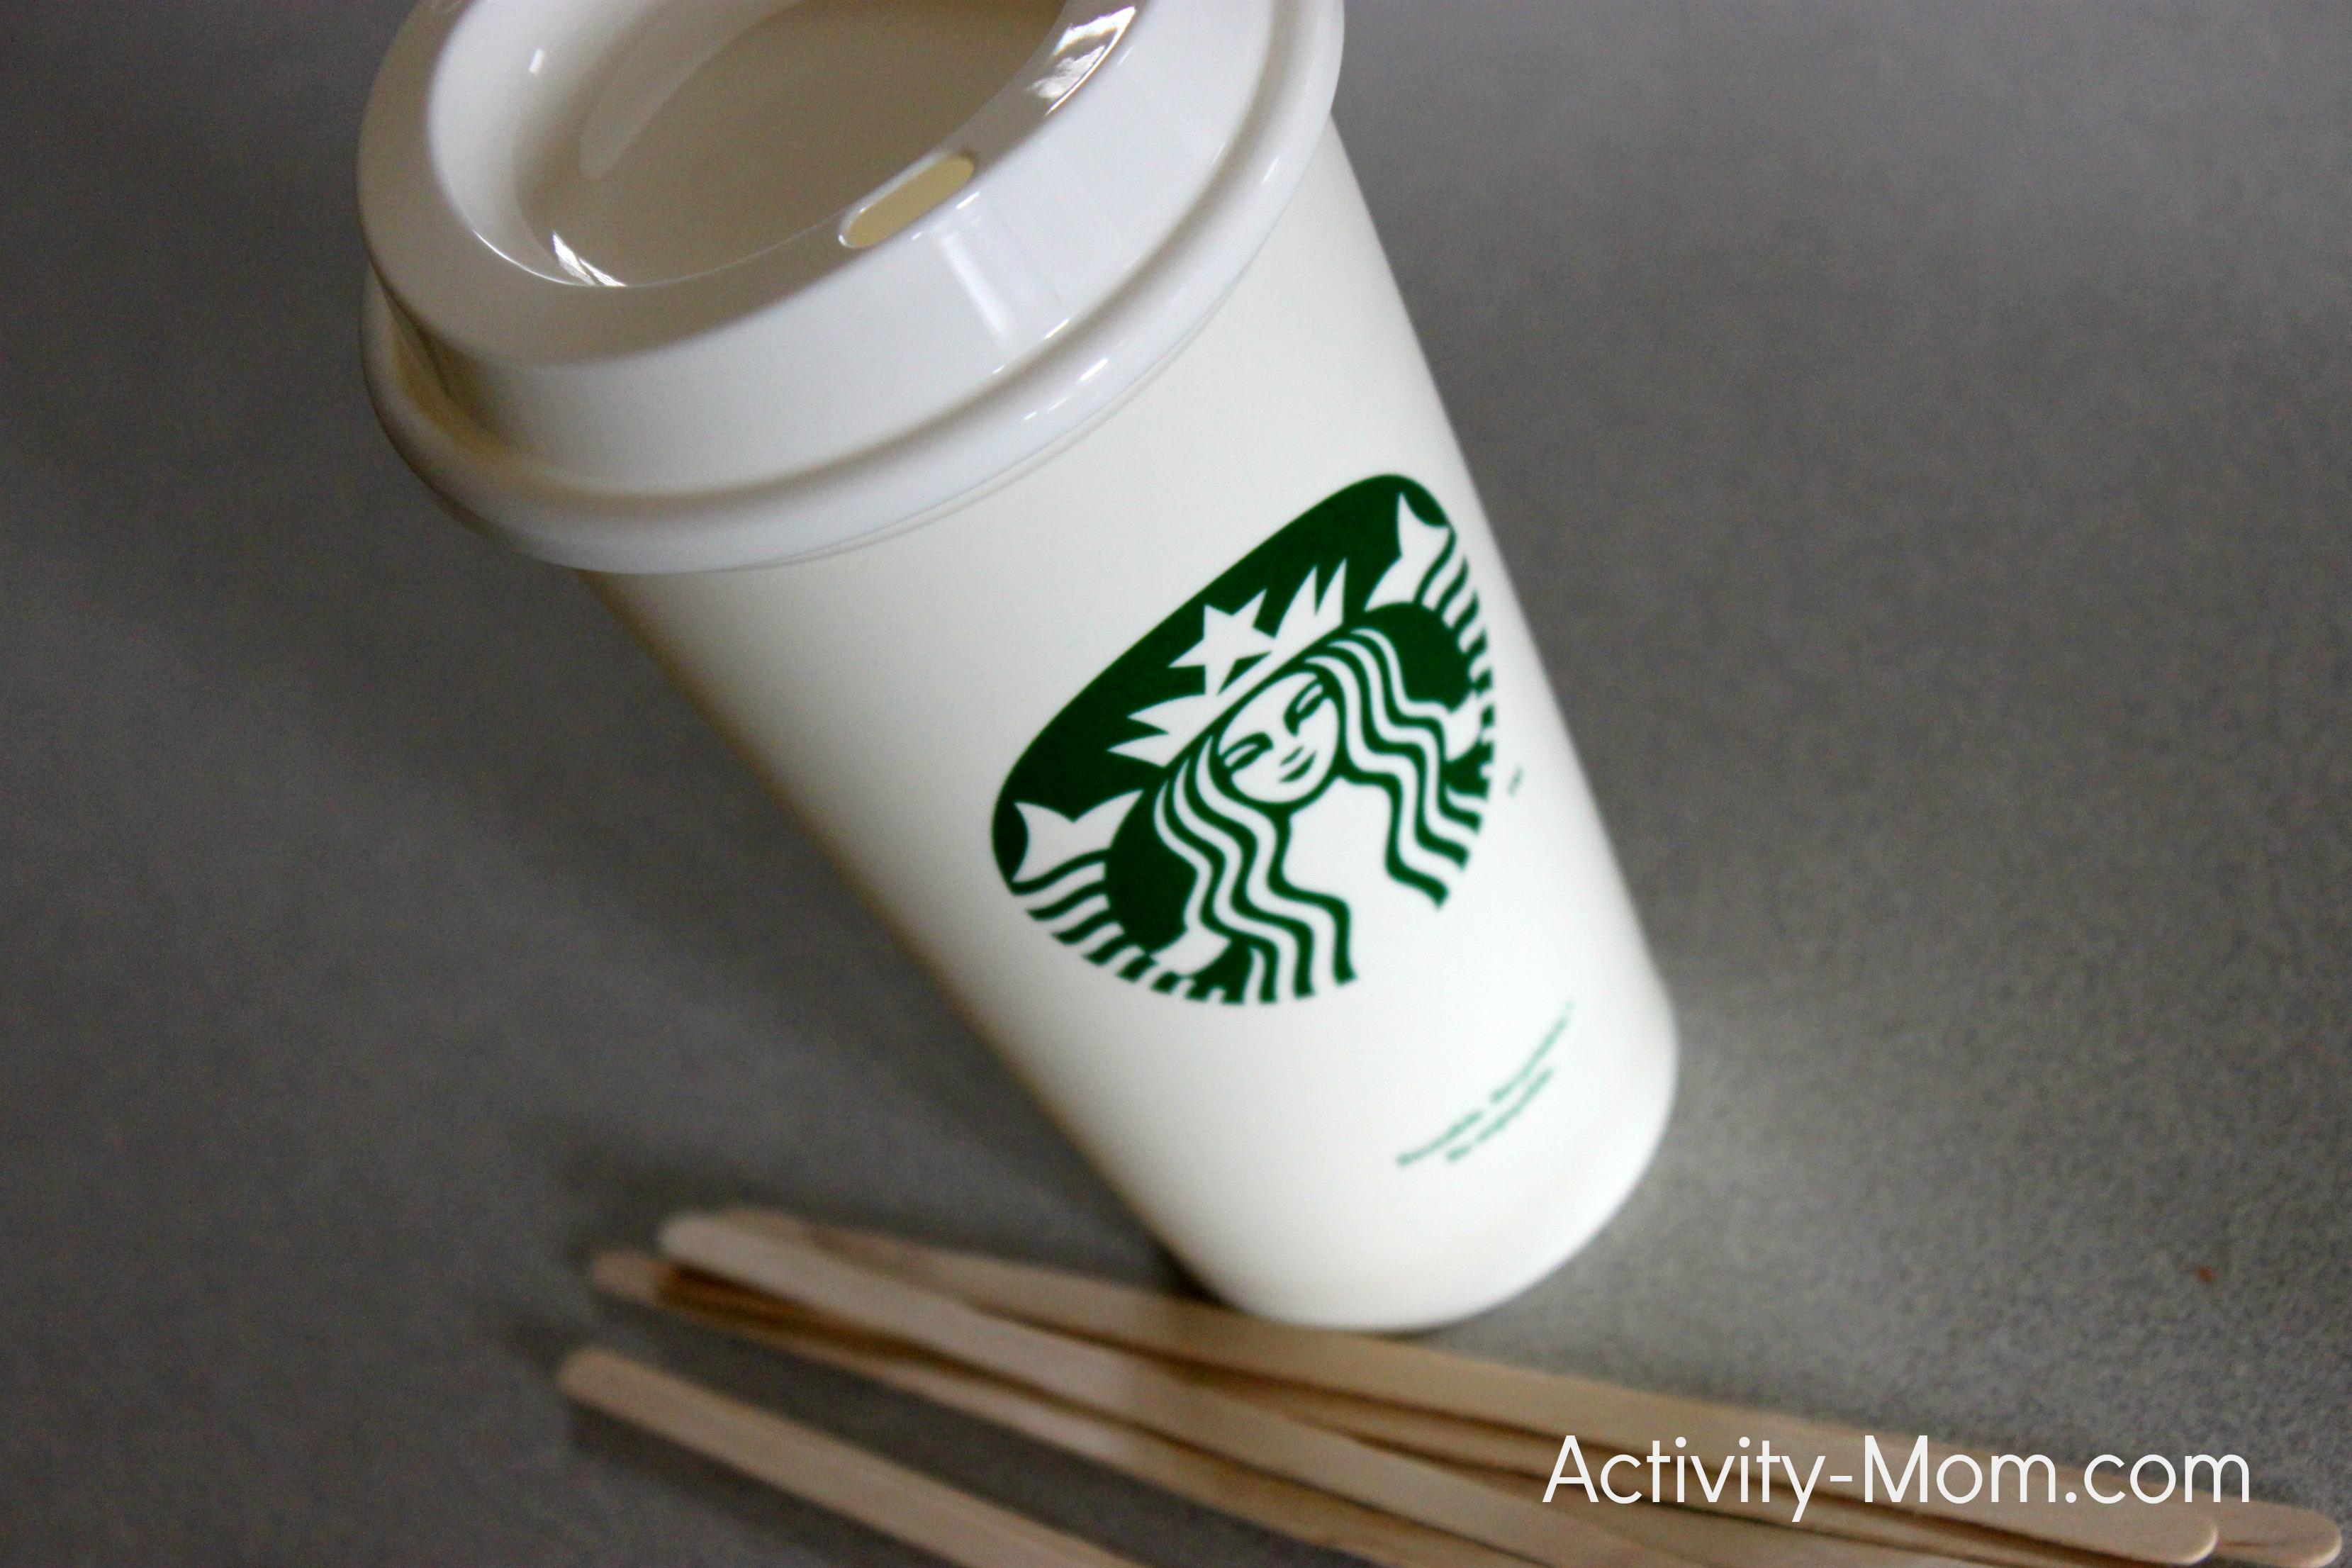 Starbucks Activity